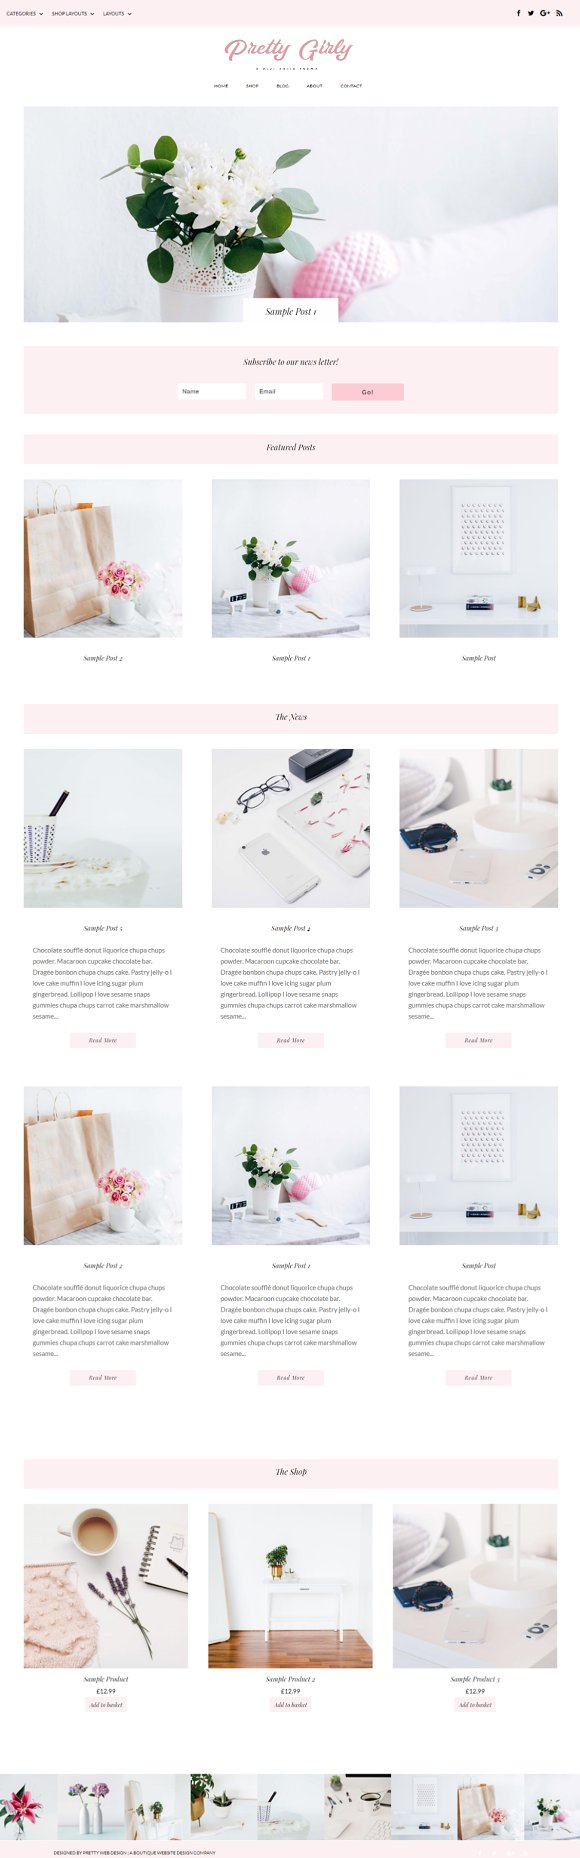 pretty girly wordpress theme wordpress blog themes creative market